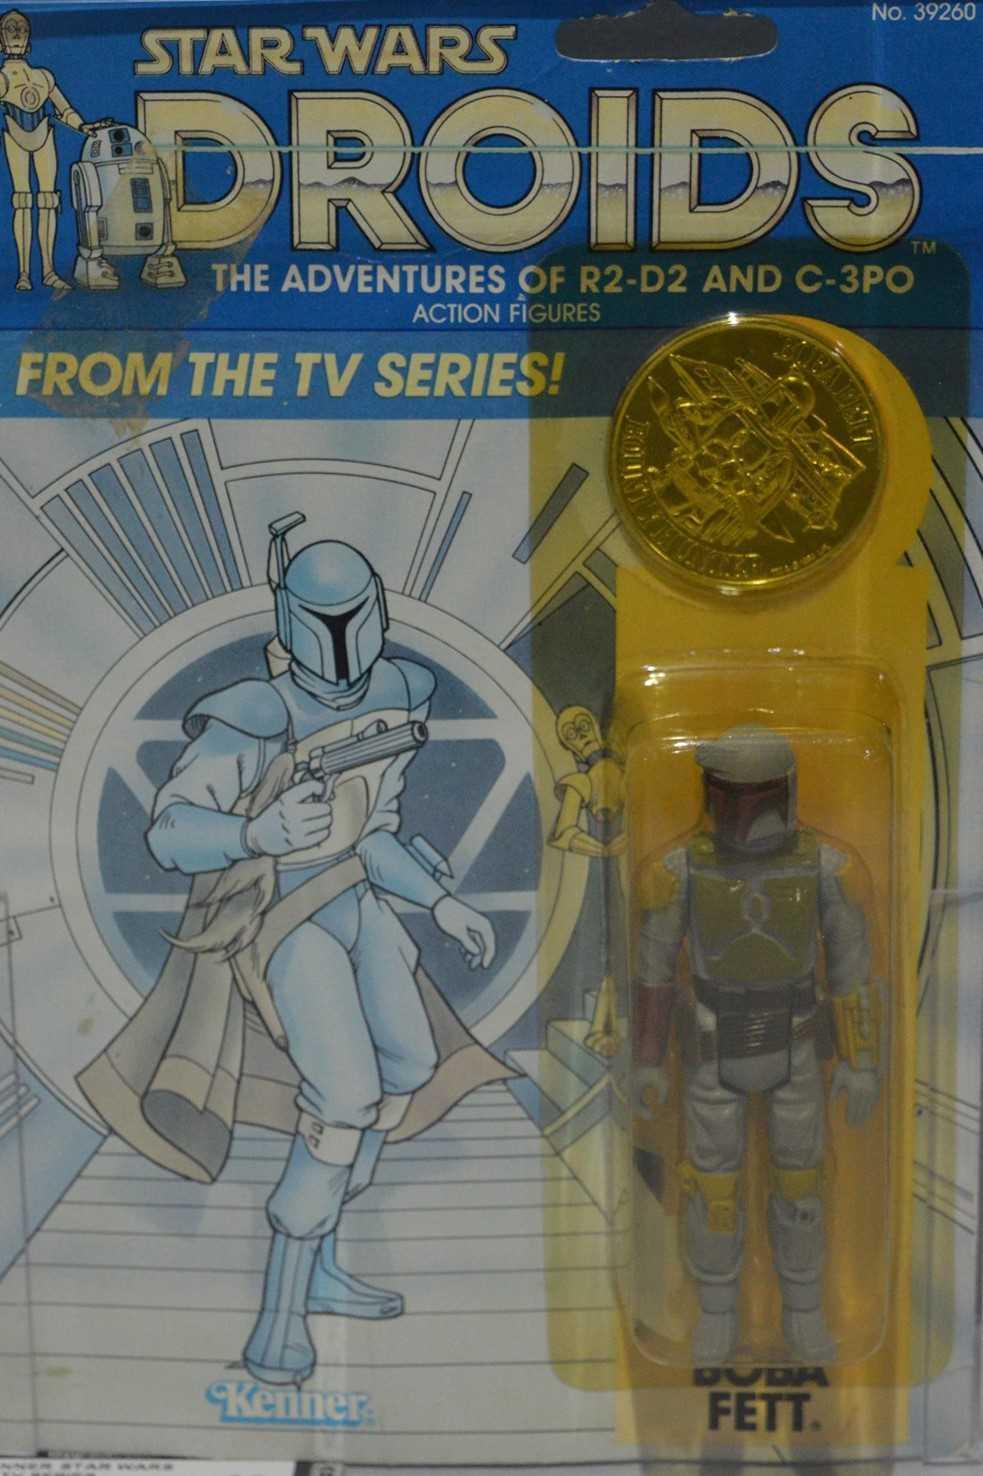 1251 - Star Wars Droids Boba Fett by Kenner